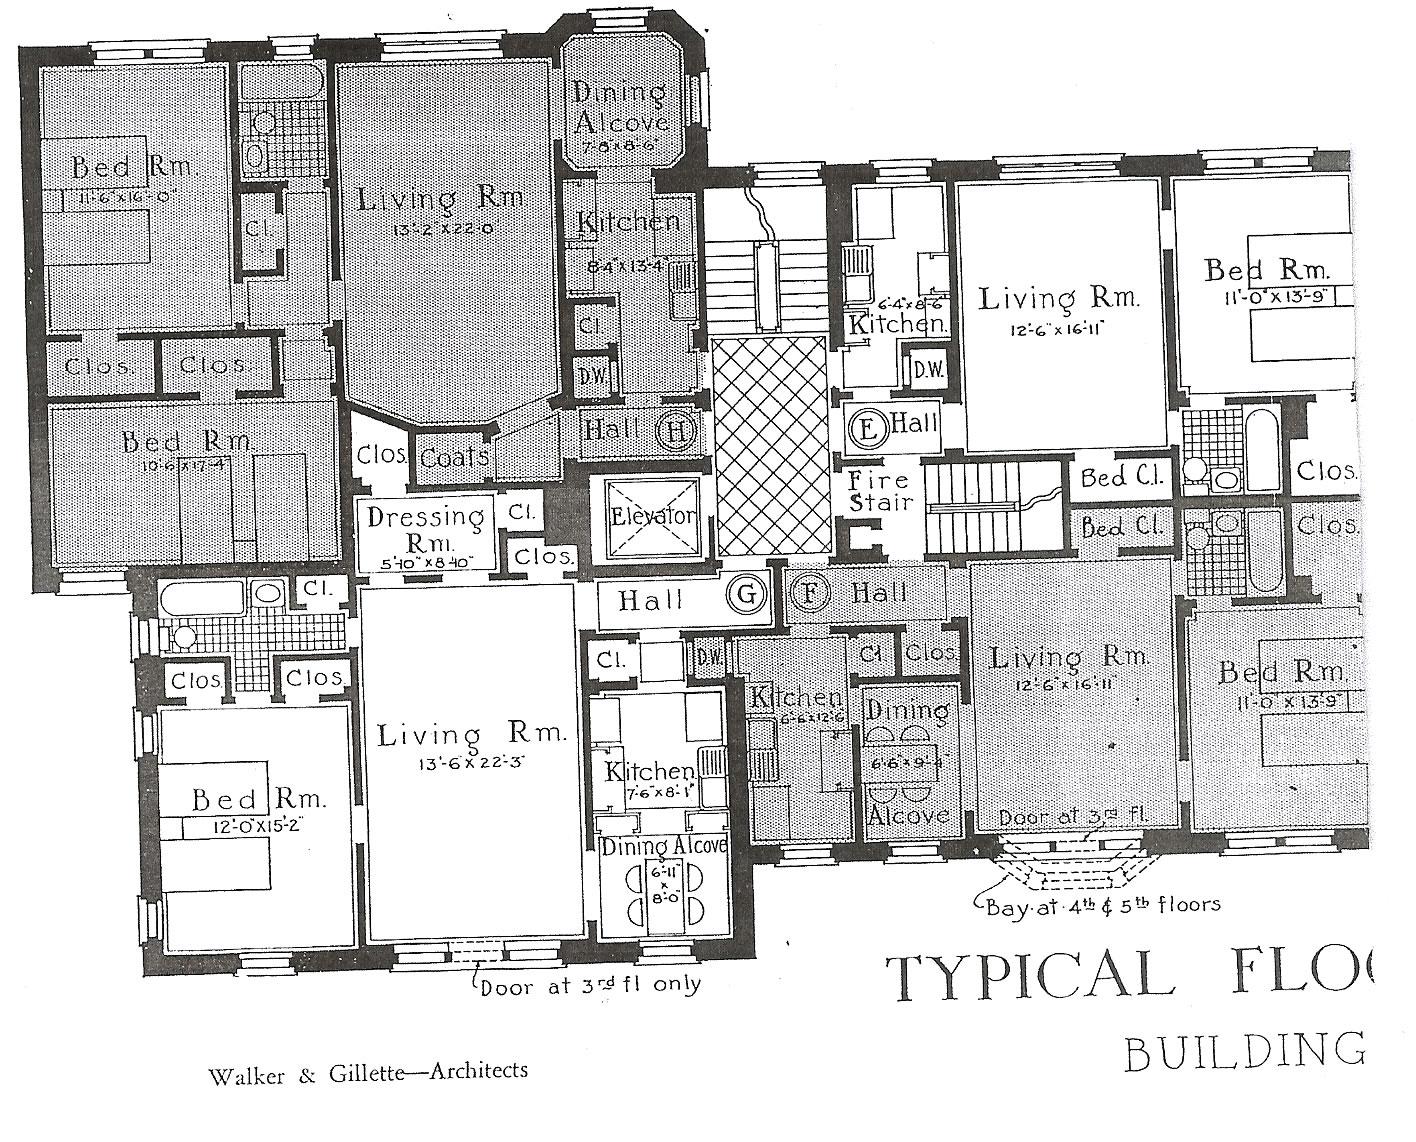 Nyc Building Floor Plans - Home Flooring Ideas